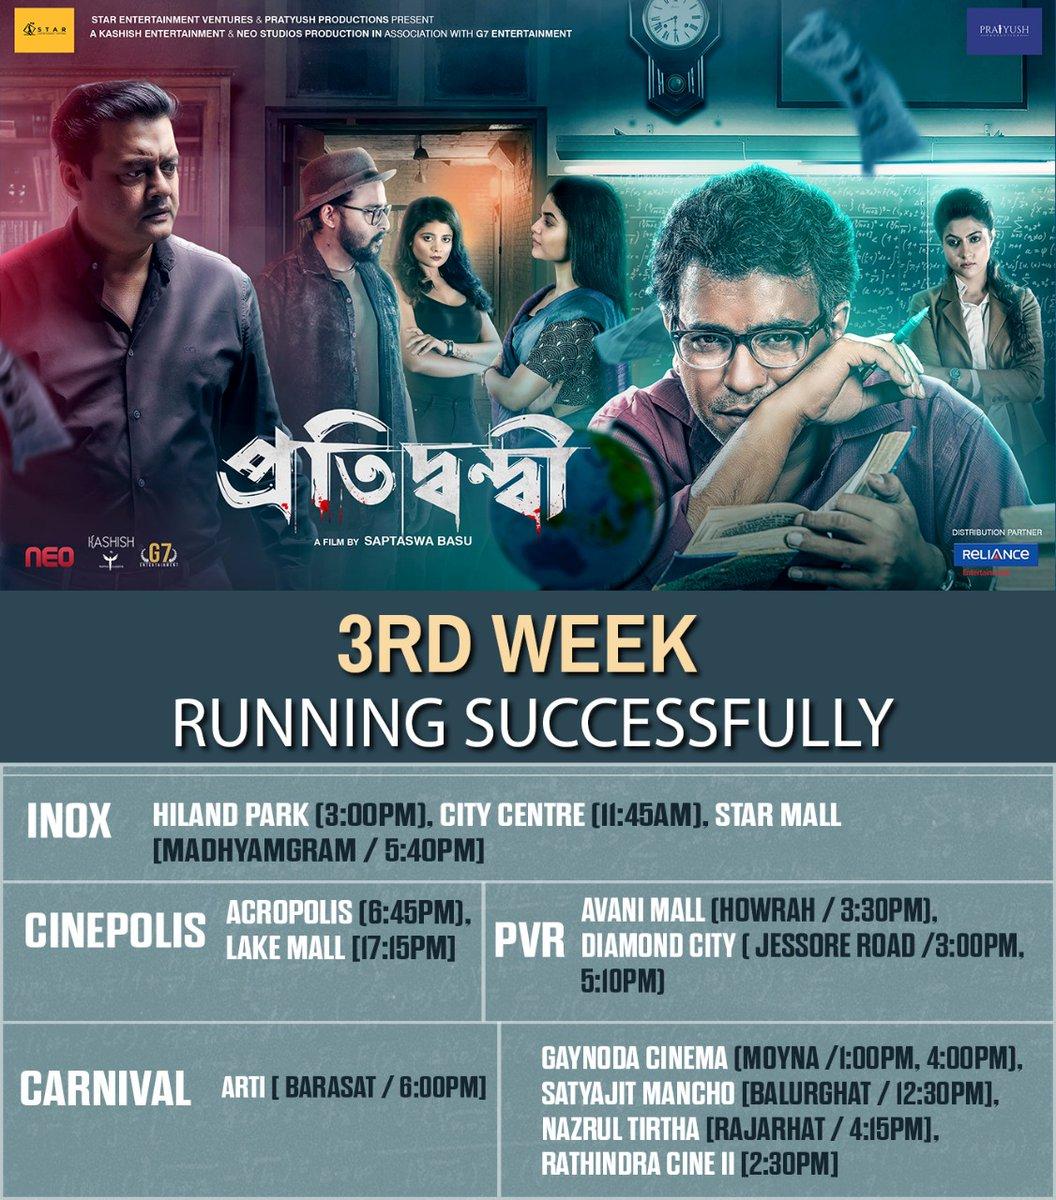 #Pratidwandi is winning hearts everywhere. Watch it now at the theatre near you and let us know your feedback.    #RunningSuccessfully #CinemasAreBack  @a_pratyush @neosurya100 #SaswataChatterjee  @ActorRudranil @iamsaaurav @sayani06